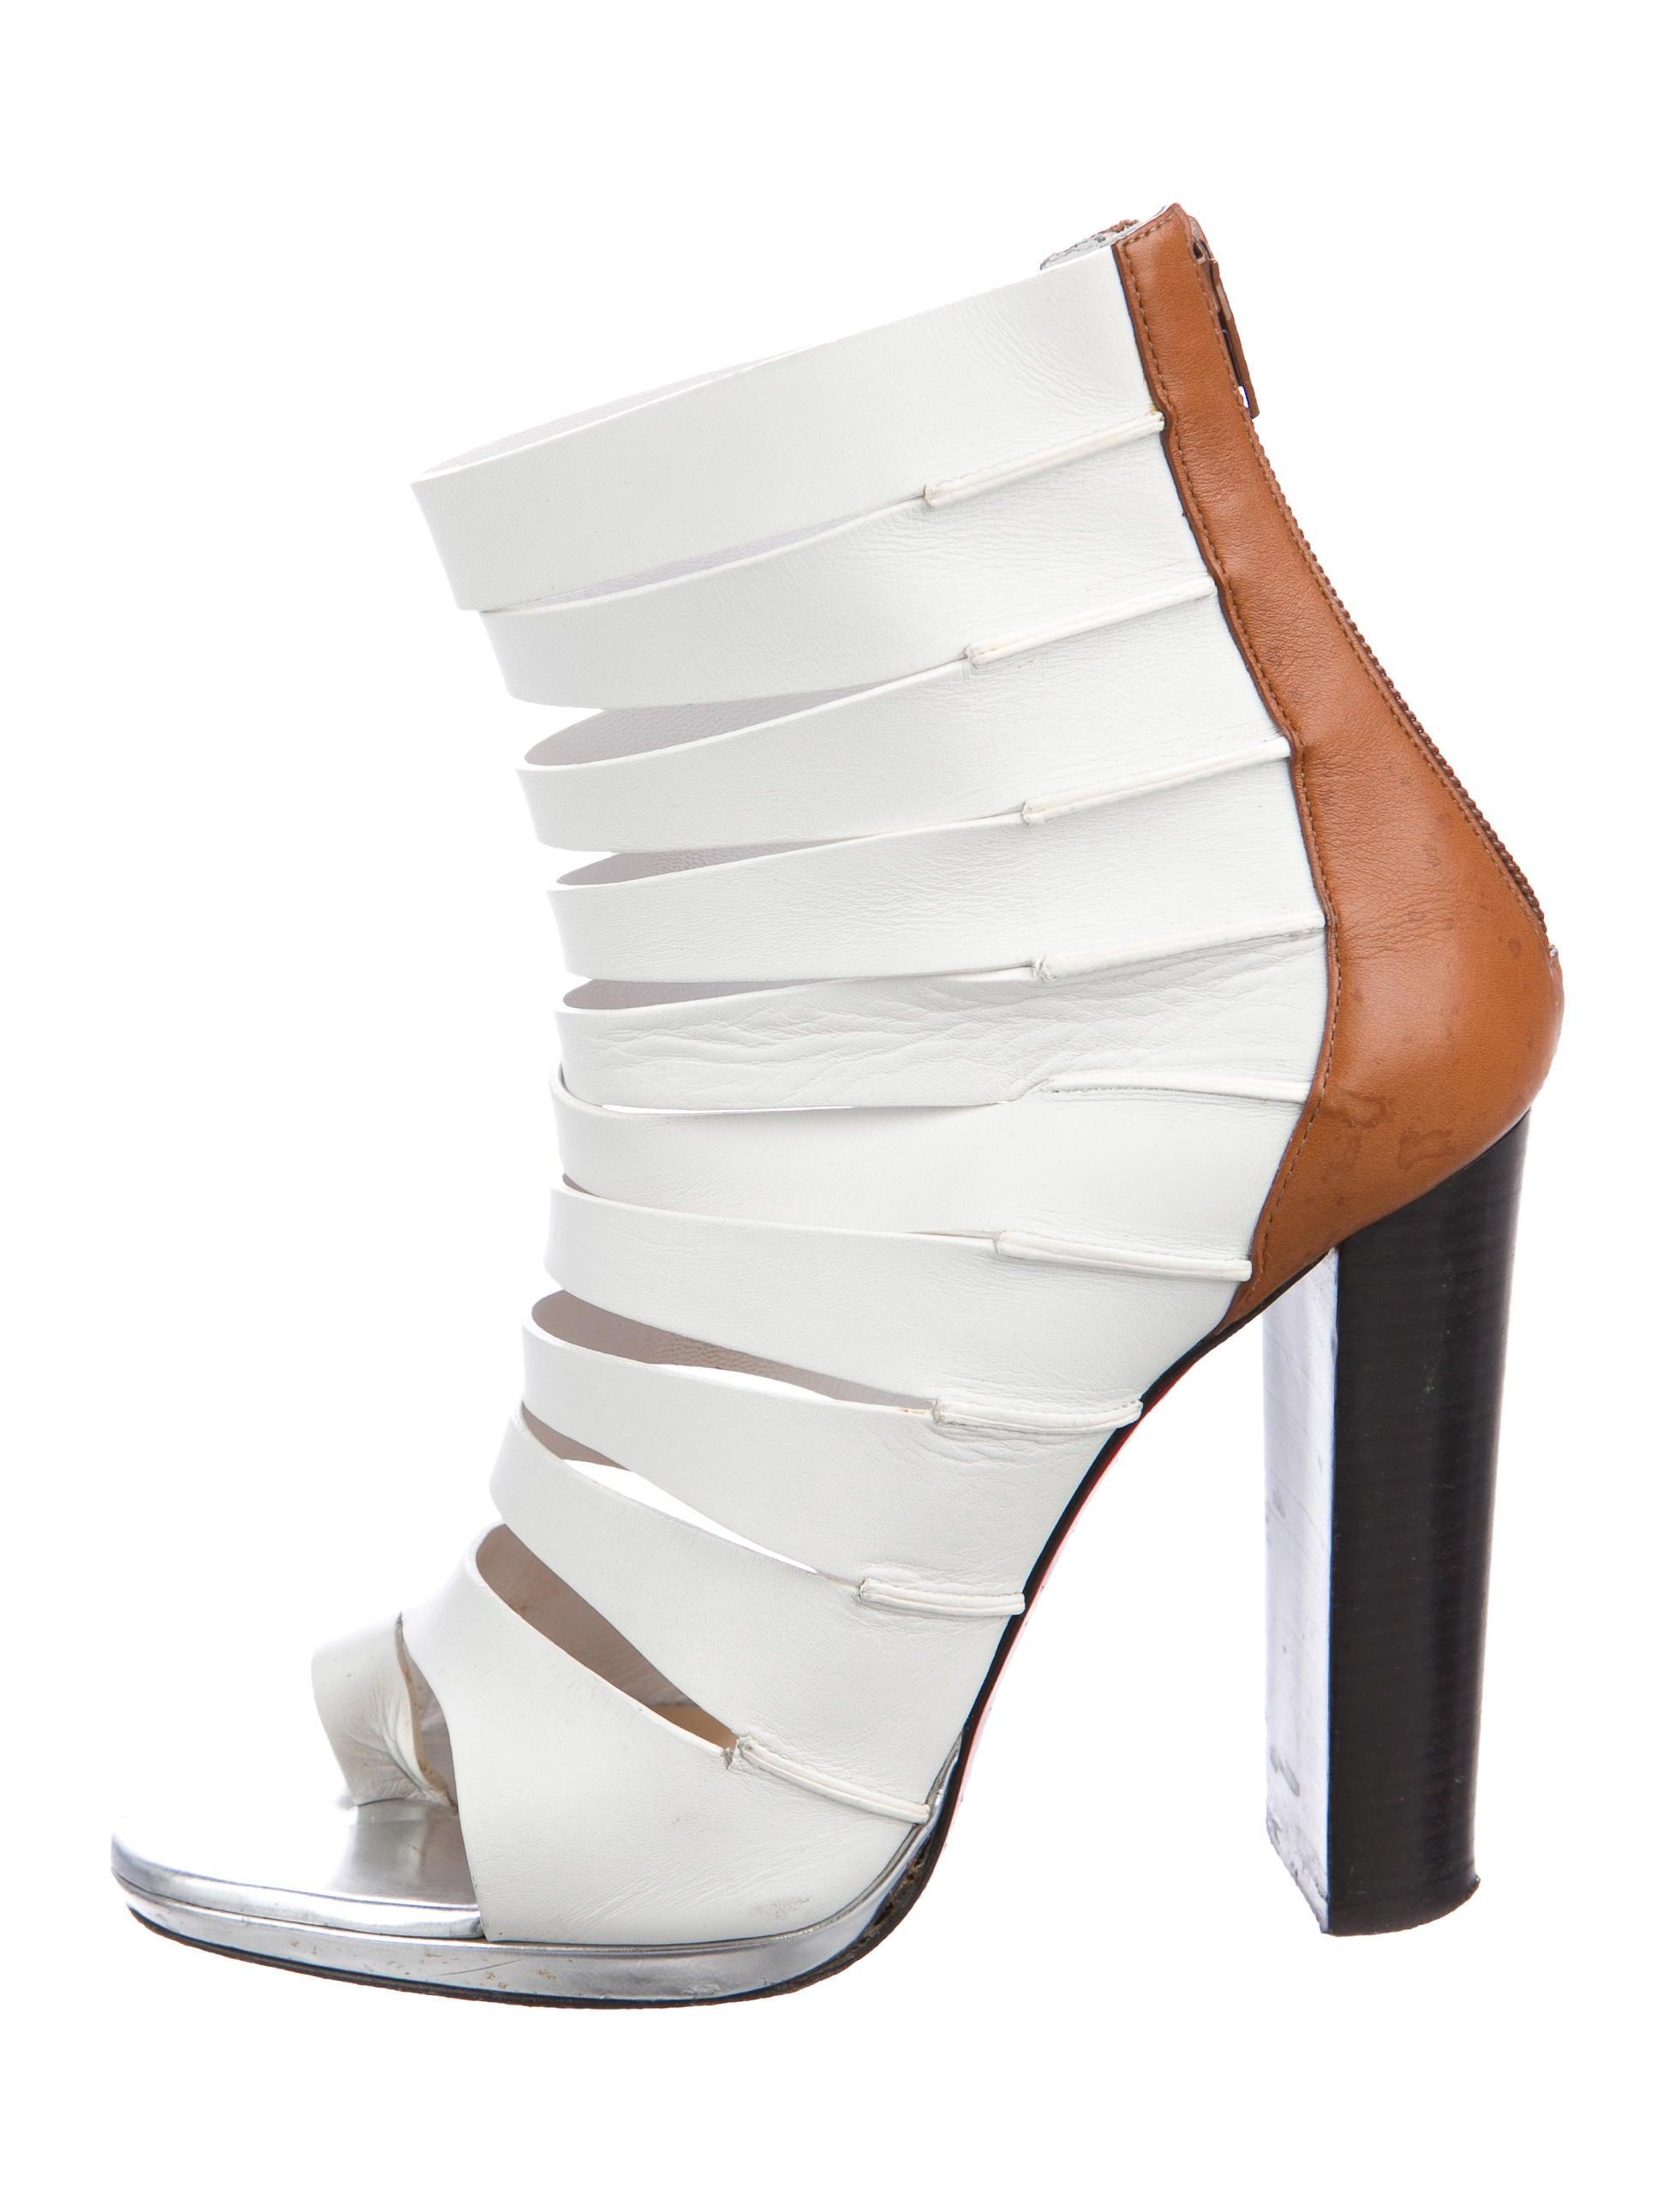 Christian Louboutin Decoupata Cutout Sandals sast cheap online clearance many kinds of discount perfect nzIZu